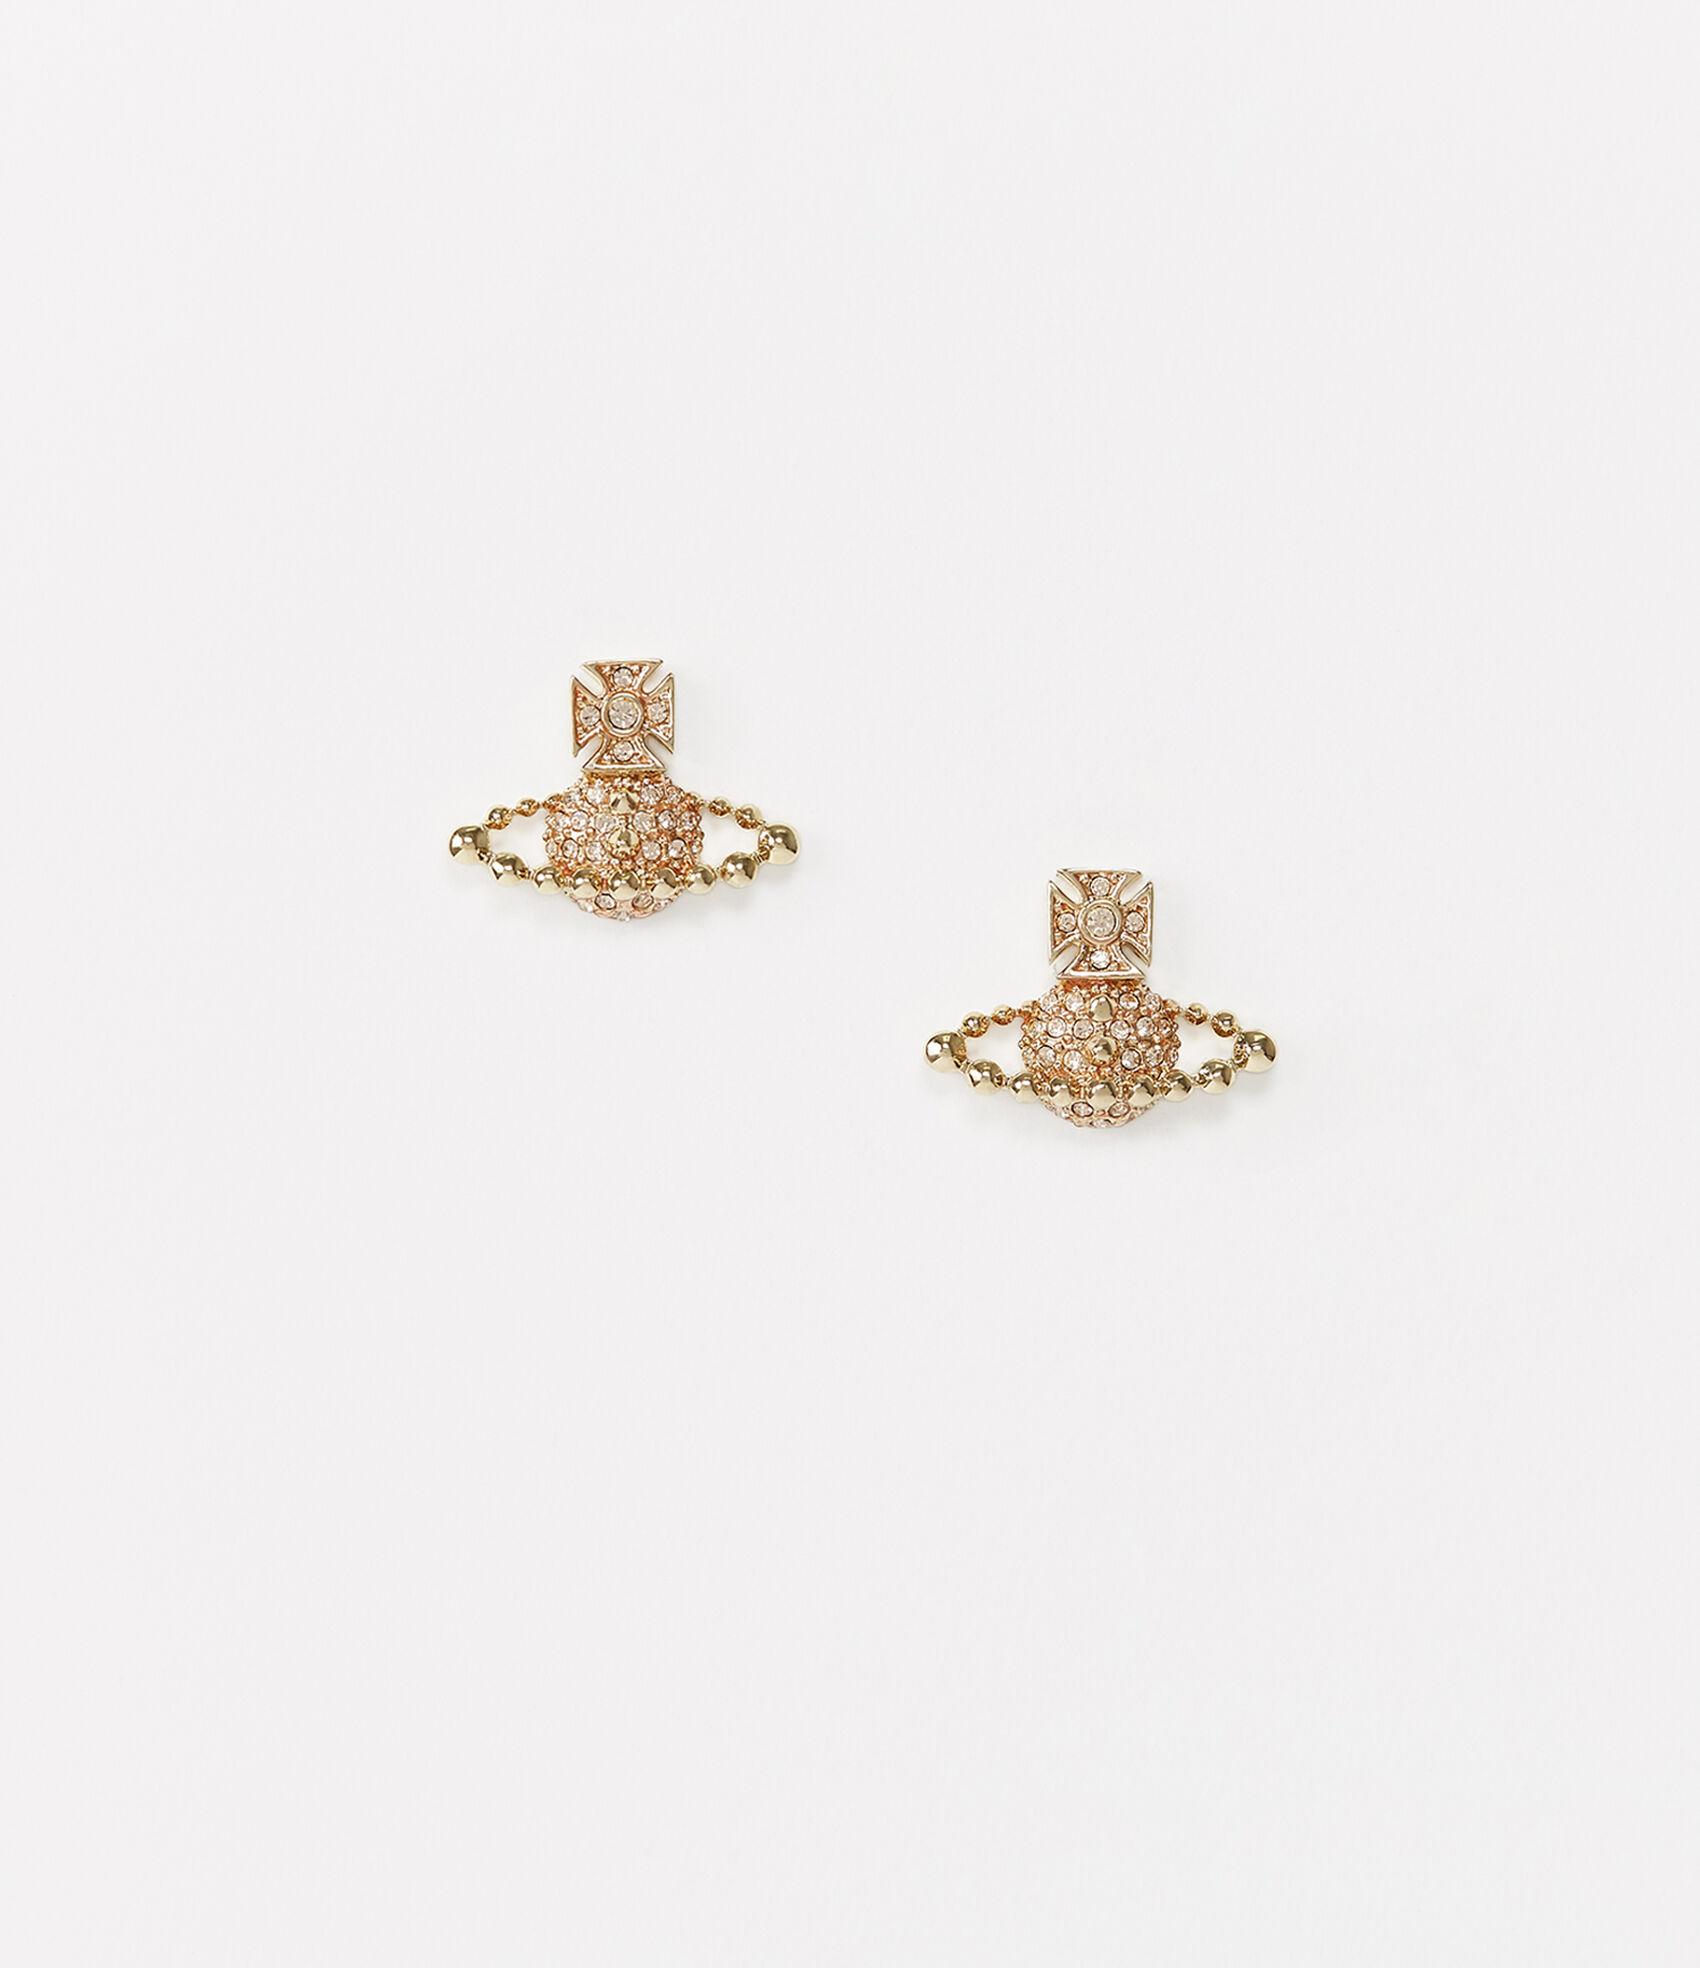 7a263777211f4e Lena Bas Relief Earrings Gold Tone